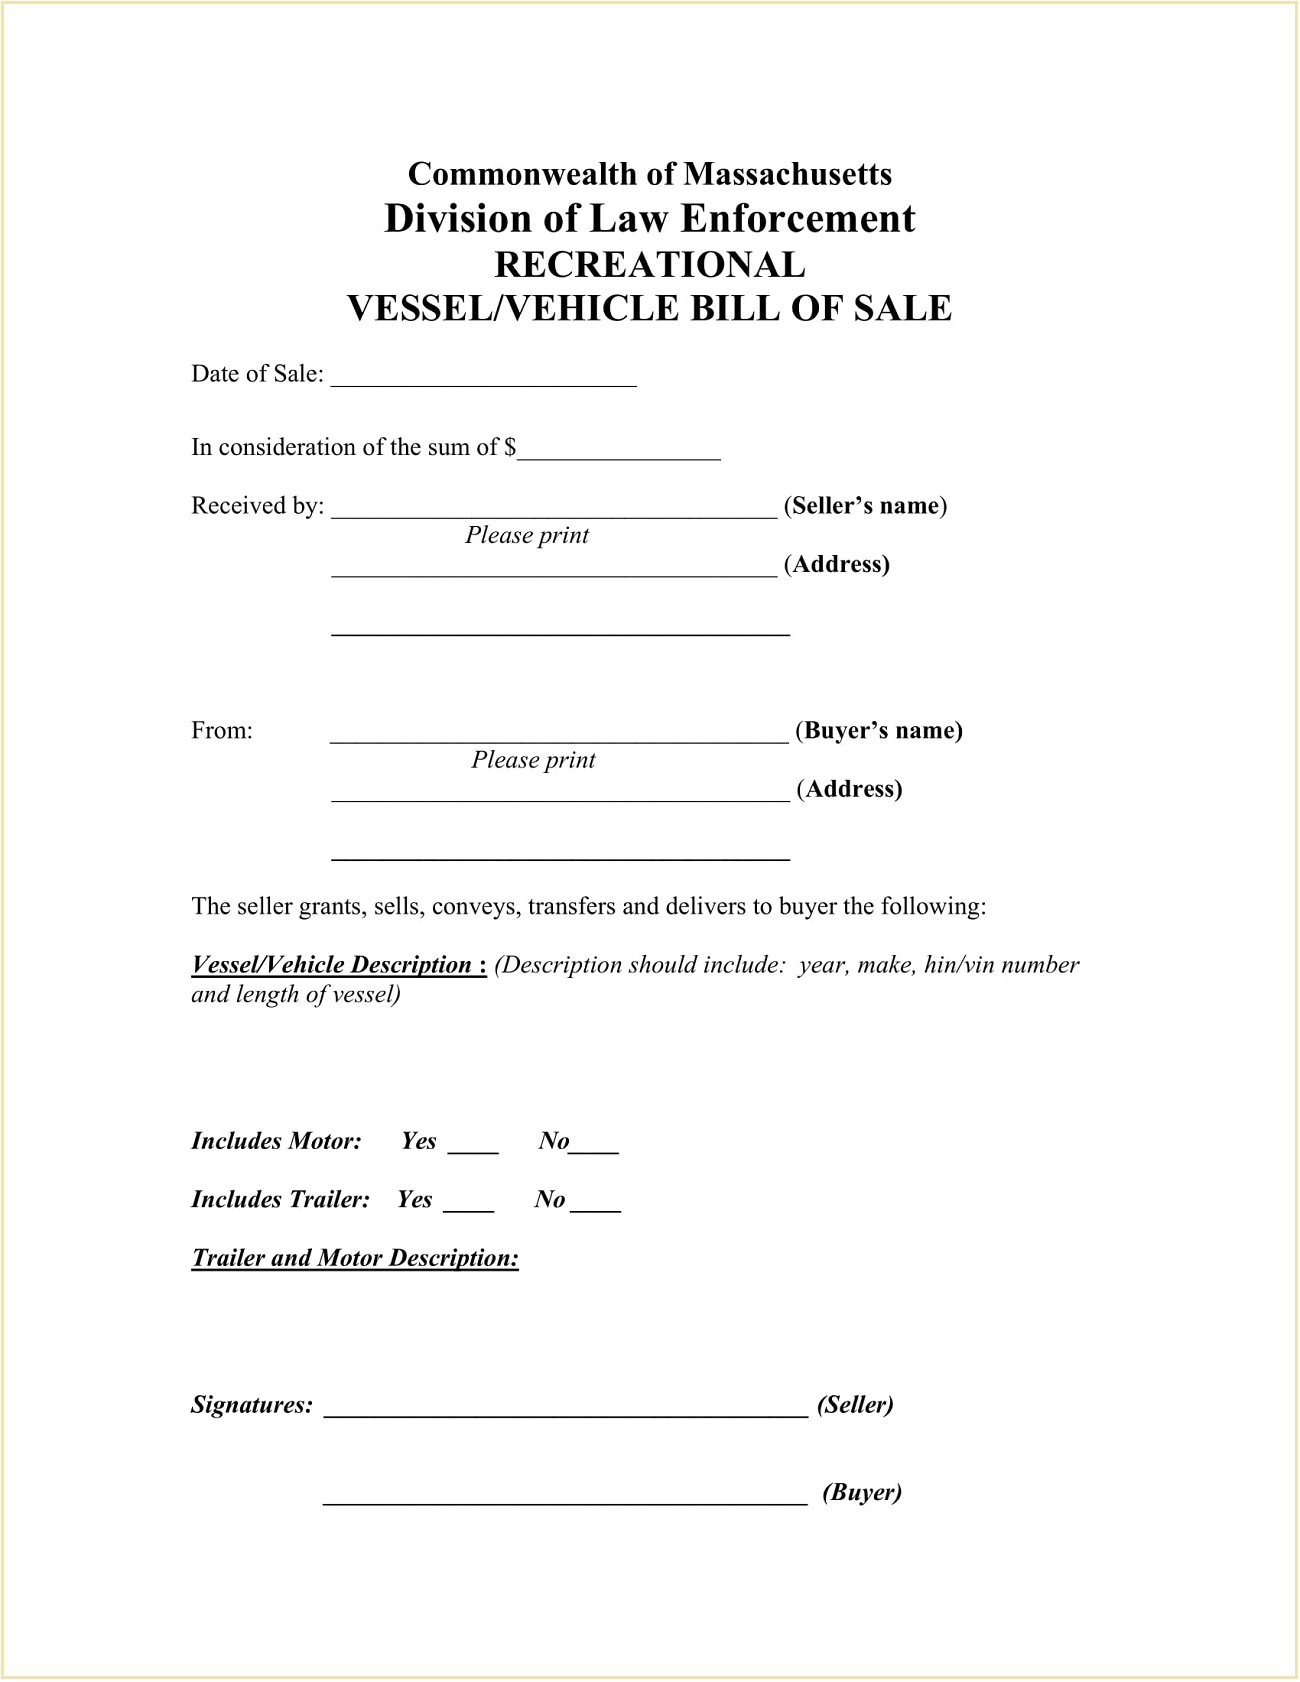 Massachusetts Recreational Vessel Boat Vehicle Bill of Sale Form Template PDF